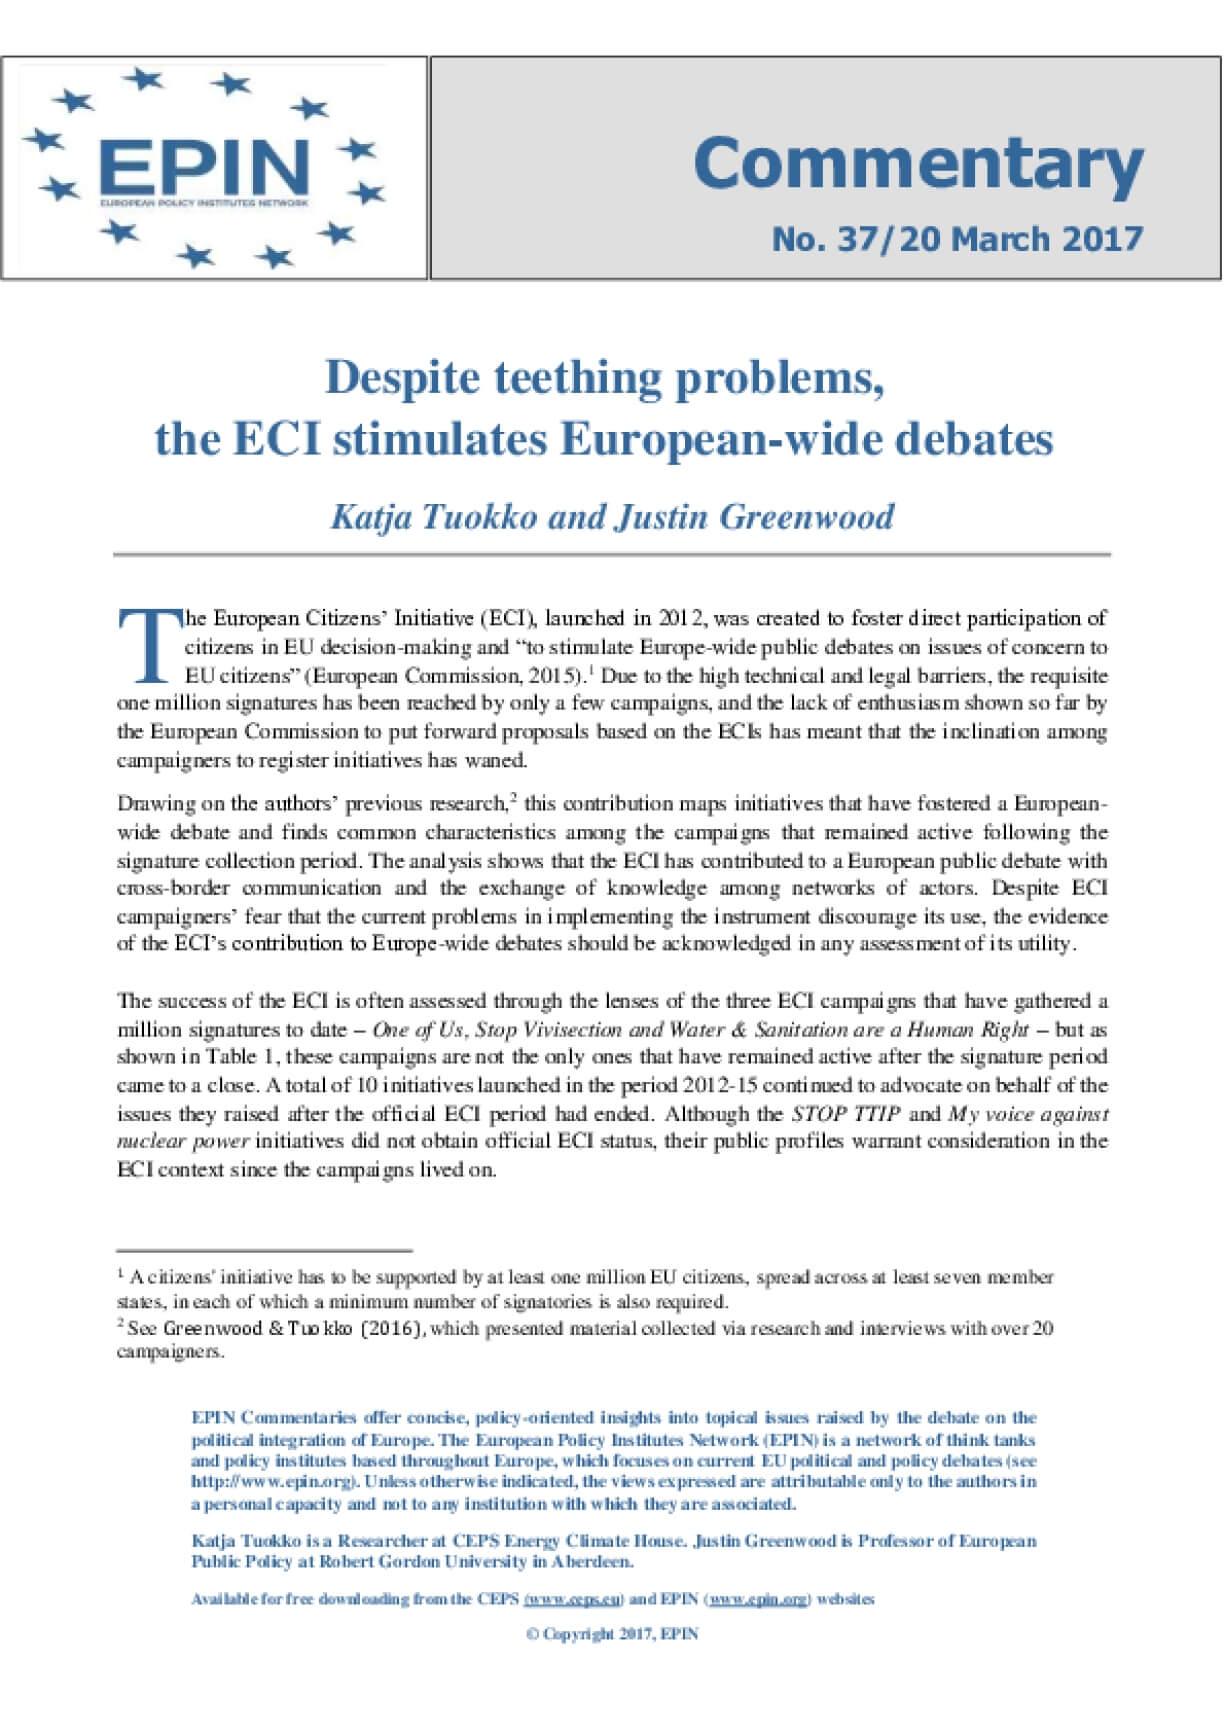 Despite teething problems, the ECI stimulates European-wide debates